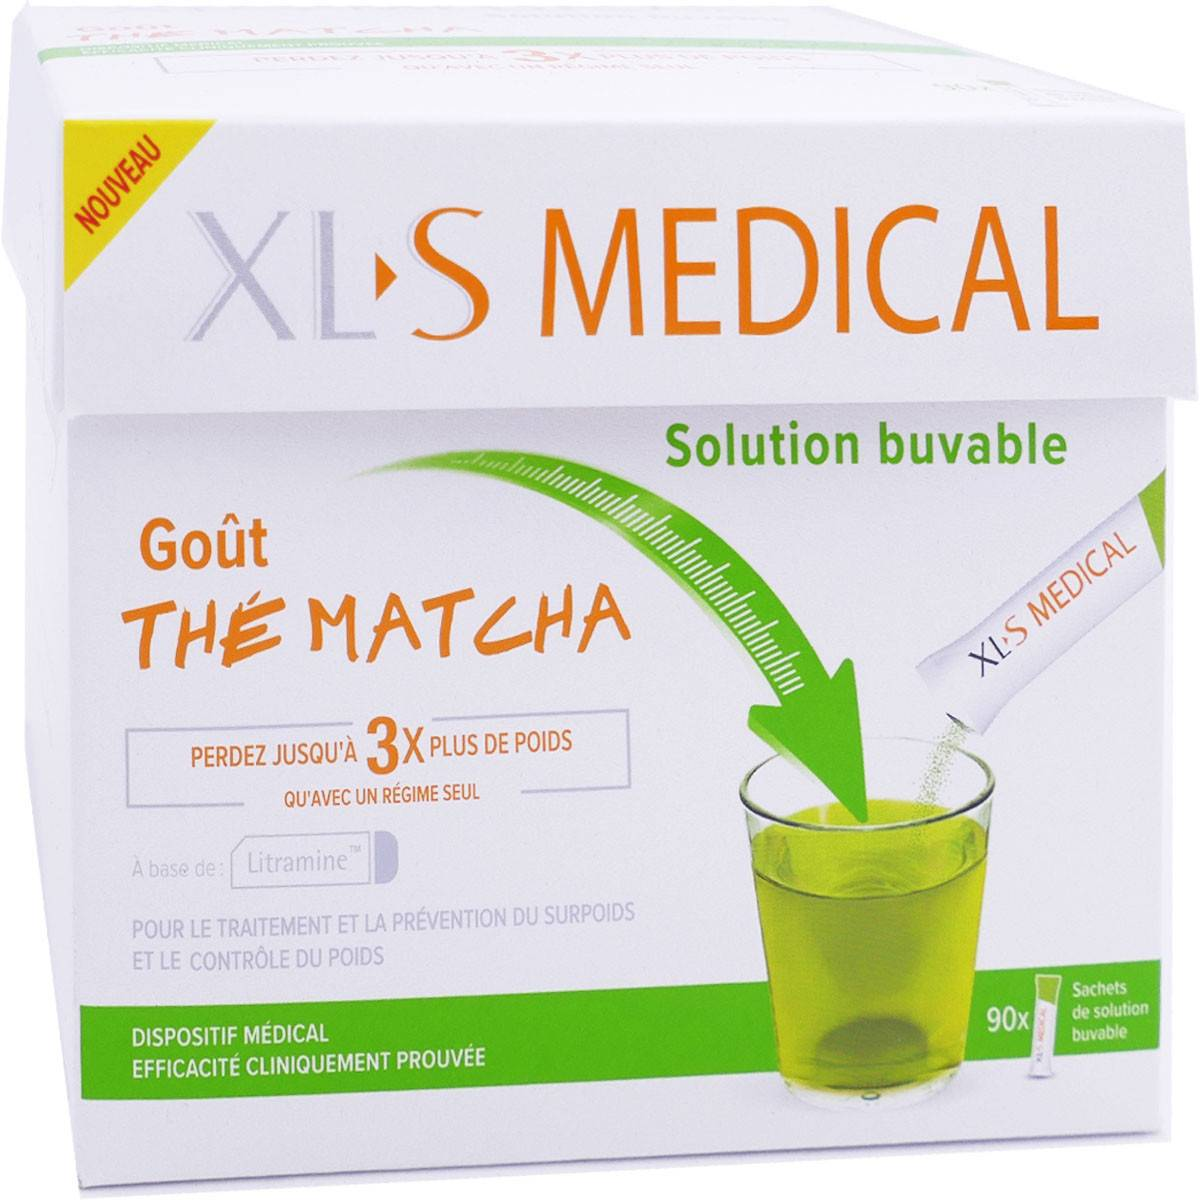 OMEGA PHARMA Xls medical gout matcha 90 sachets